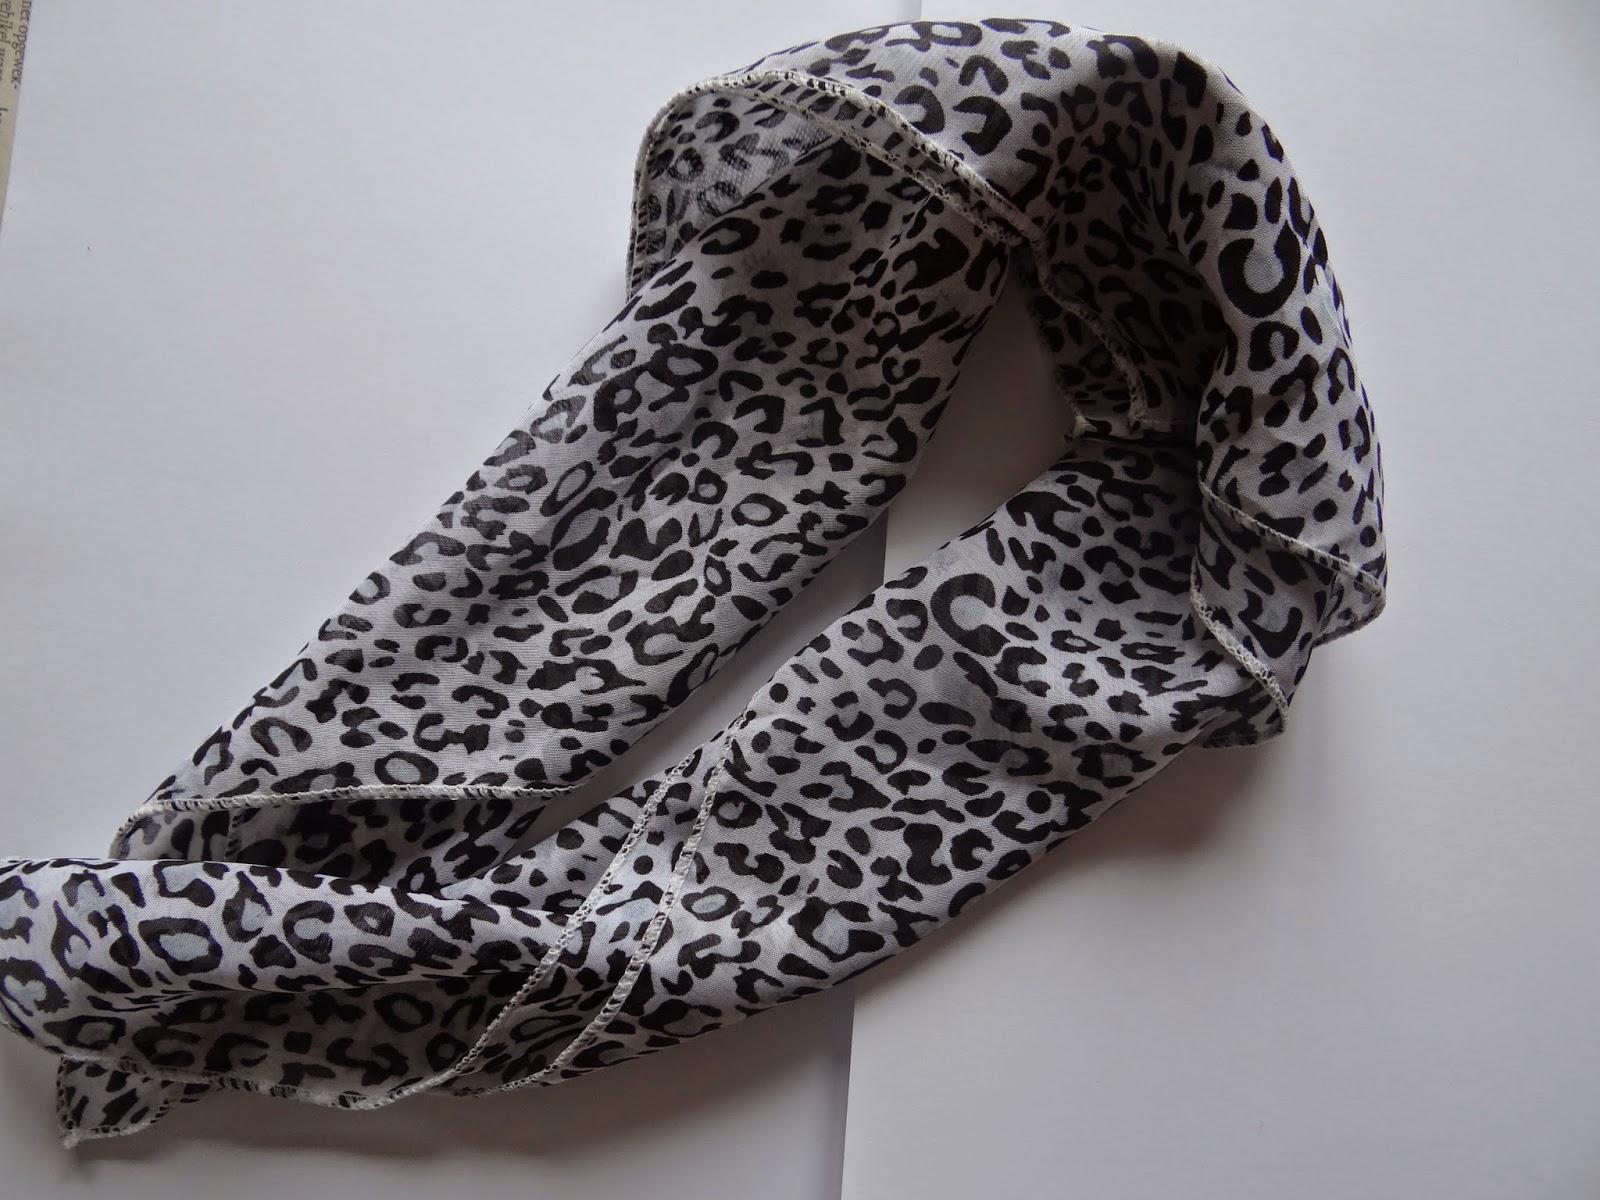 leopard print scarf luipaardprint sjaaltje shawl sjaal